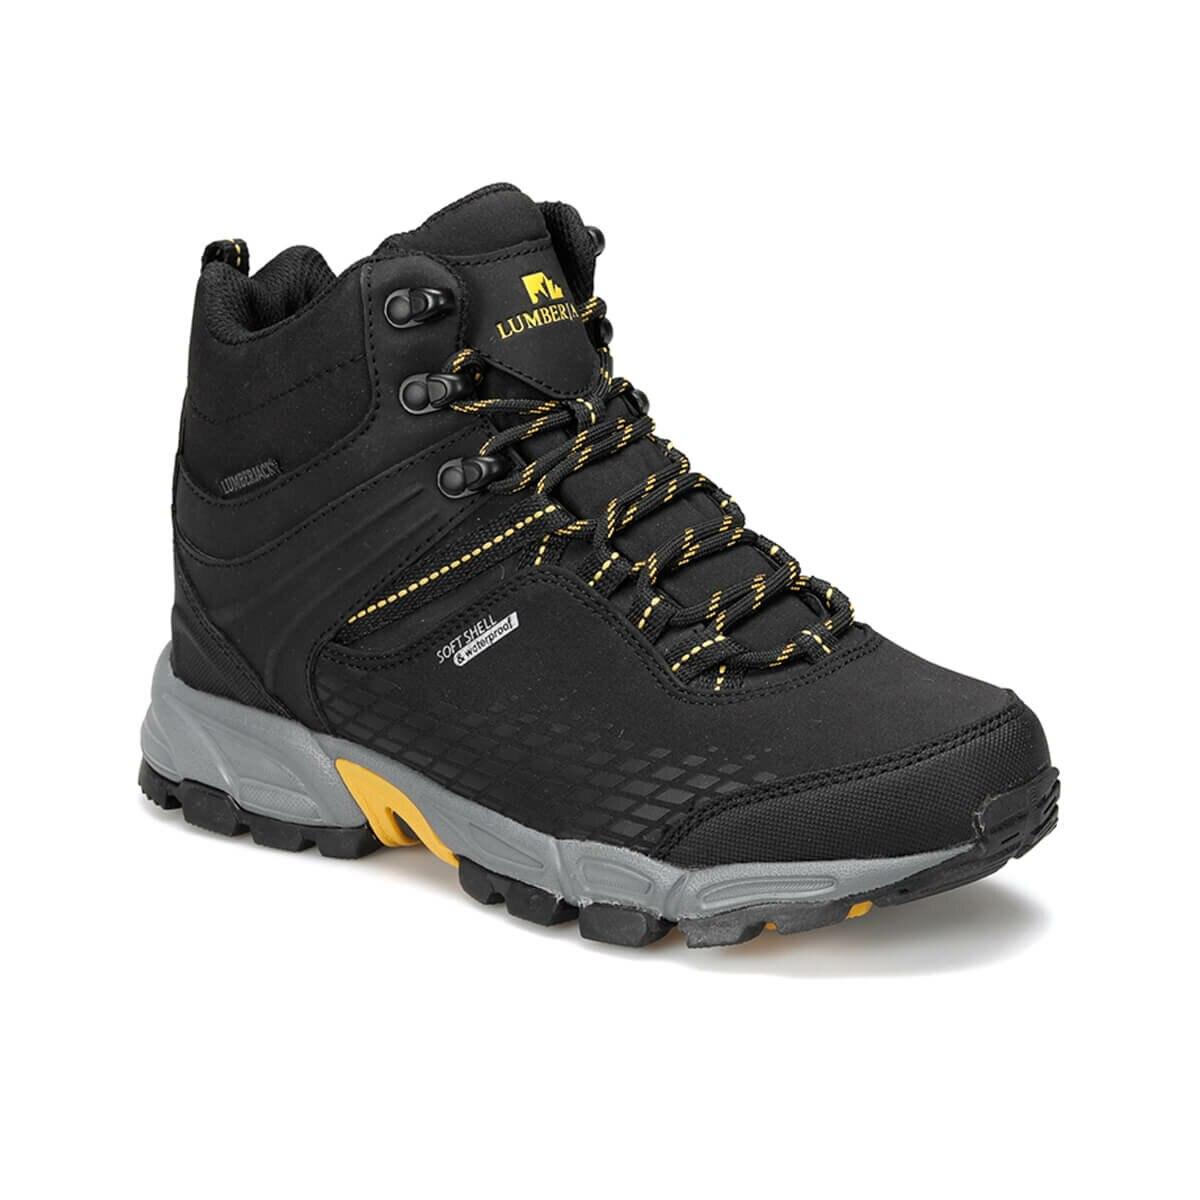 FLO FLAKE G HI 9PR Black Male Child Outdoor Boots LUMBERJACK